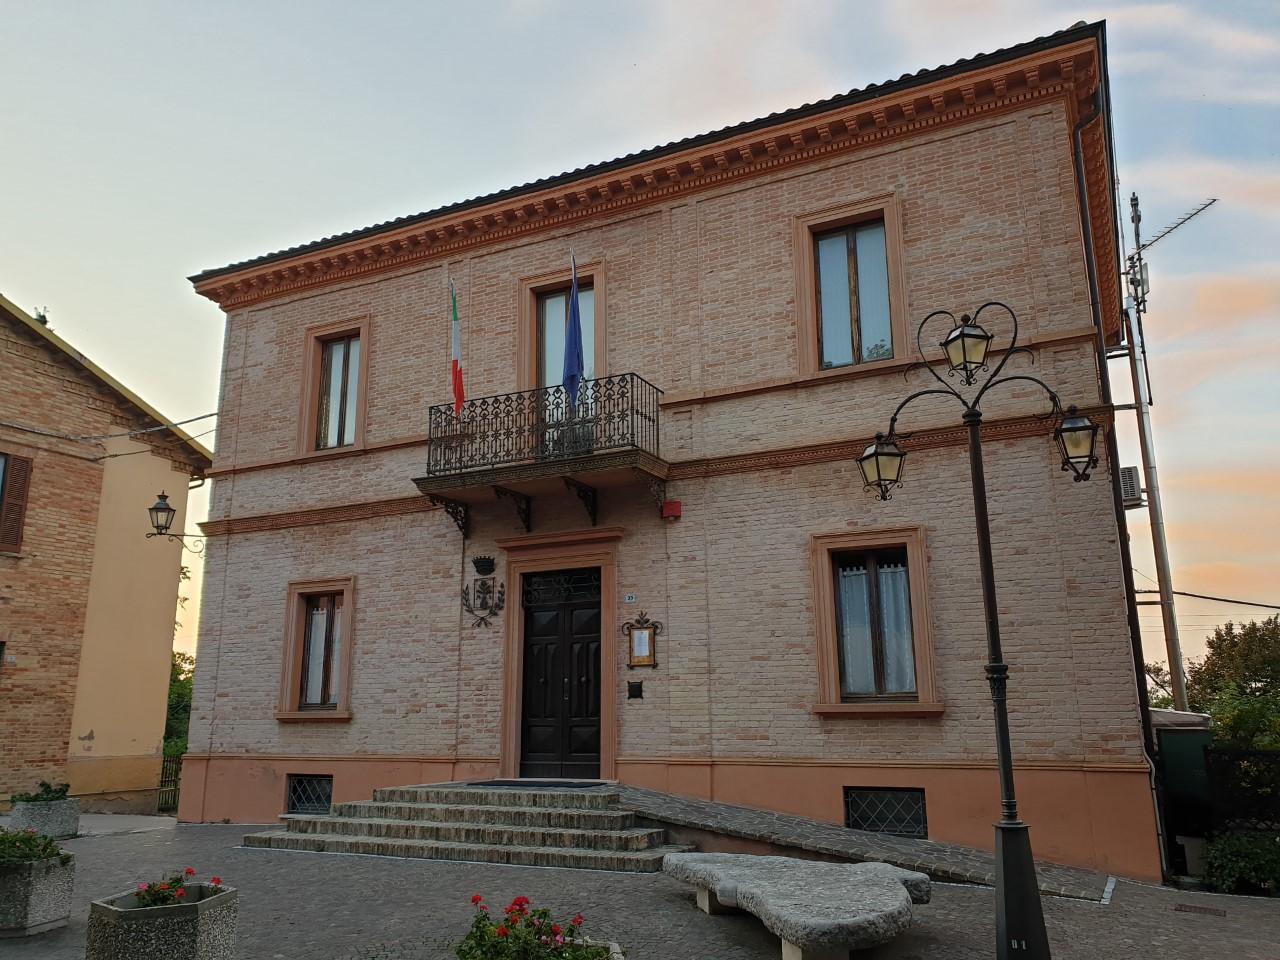 sede municipio di Monteciccardo